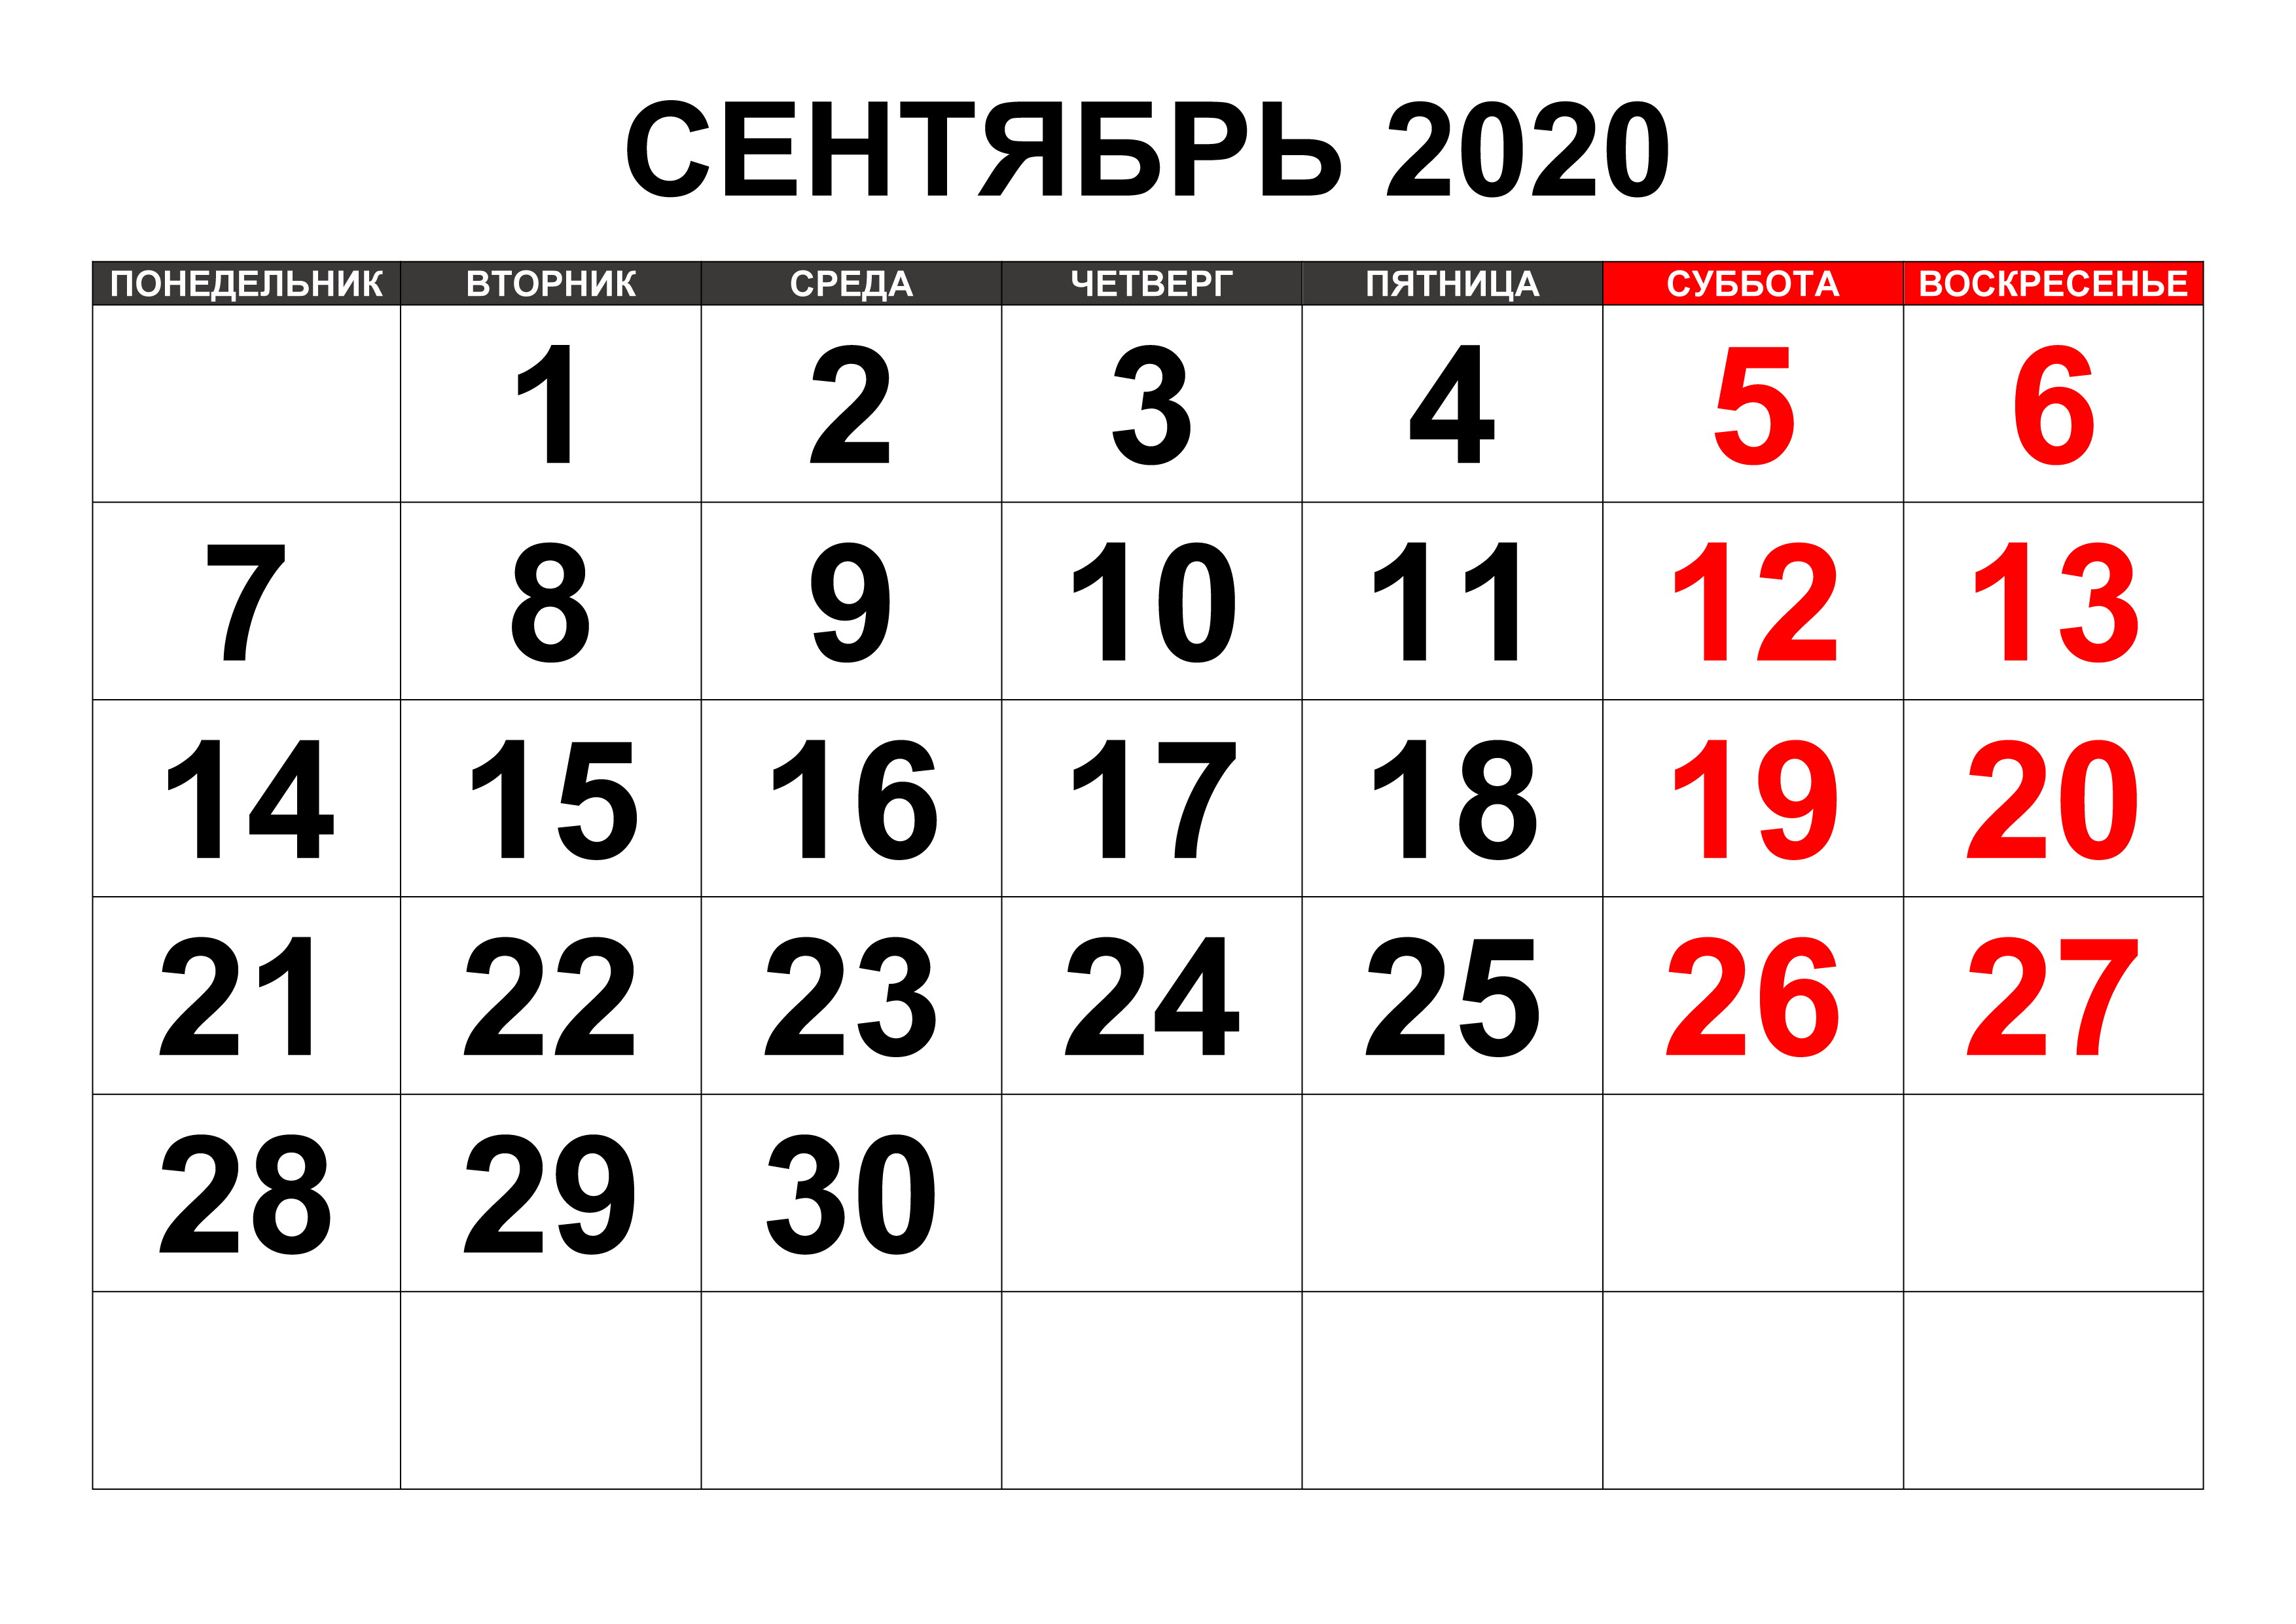 Календари На Сентябрь 2020 Года — Calendarbox.ru within Бланк Календаря На Год